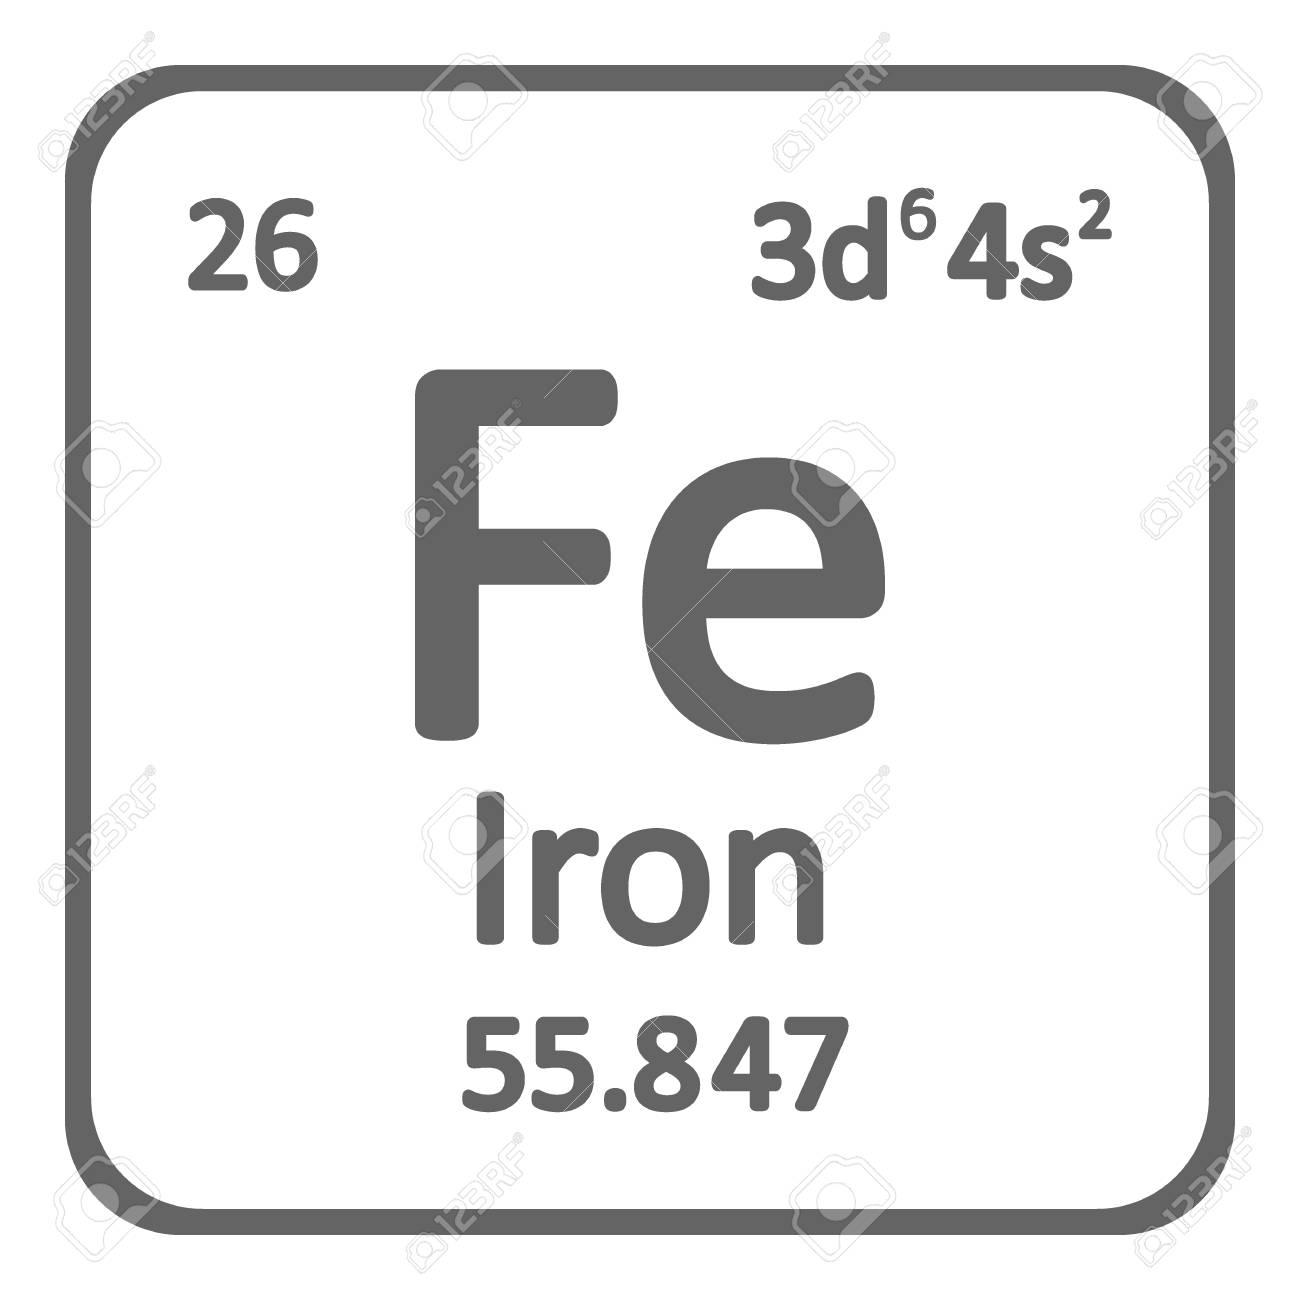 Periodic table element iron icon on white background. Vector illustration. - 104391271